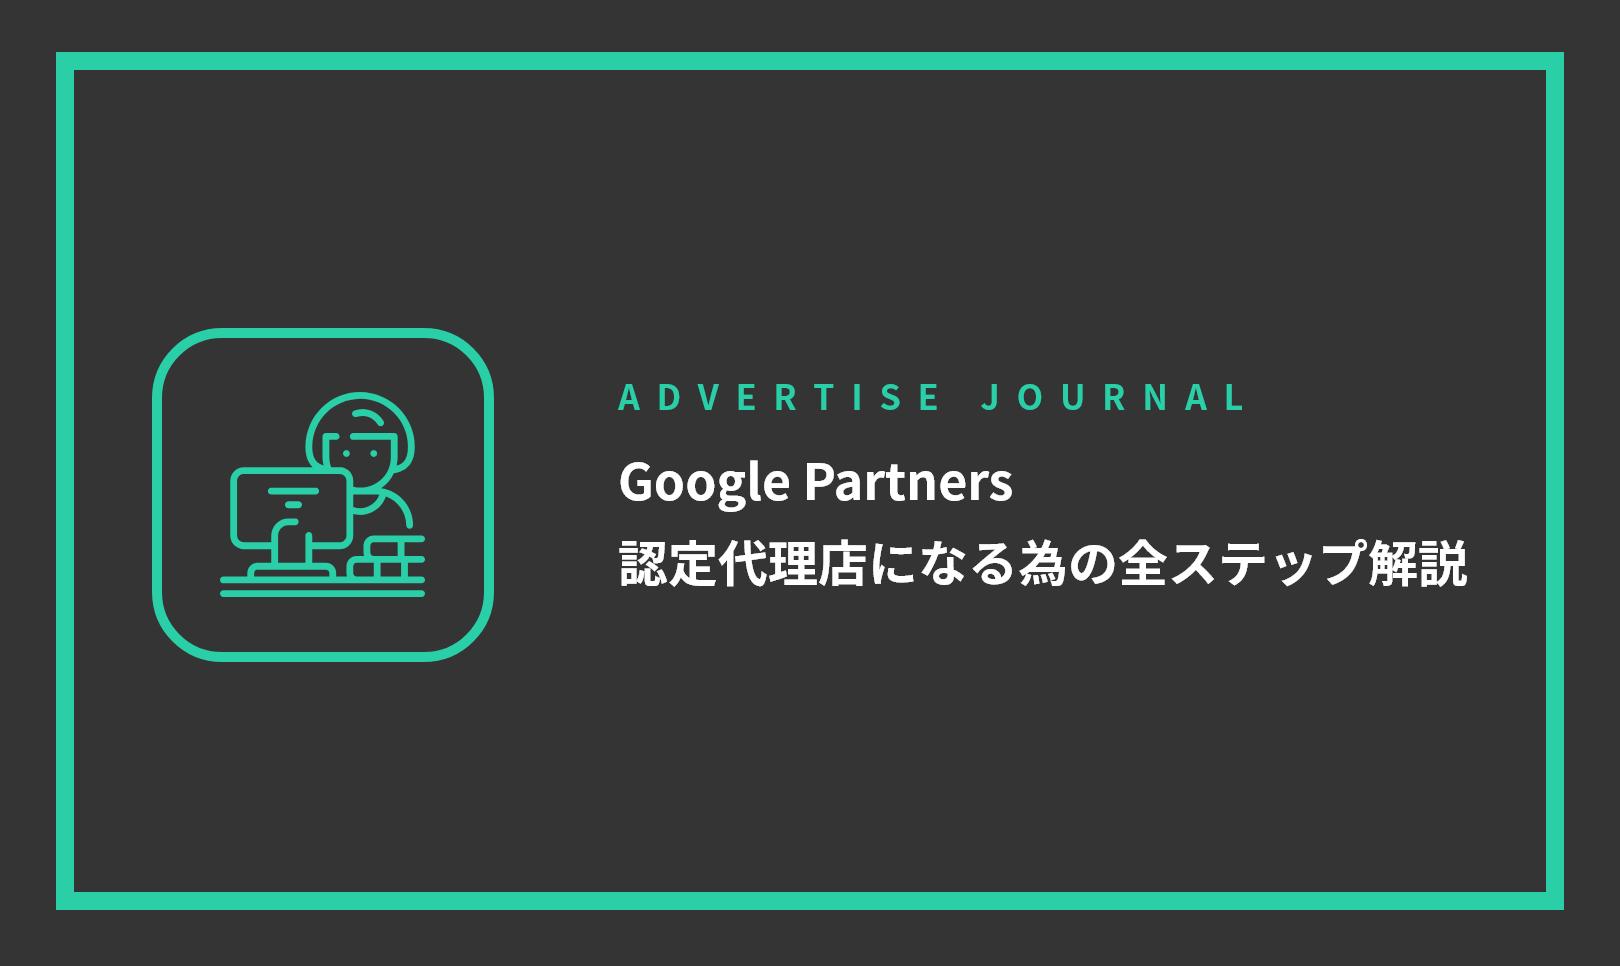 Google Partners 認定代理店になる為の全ステップ解説